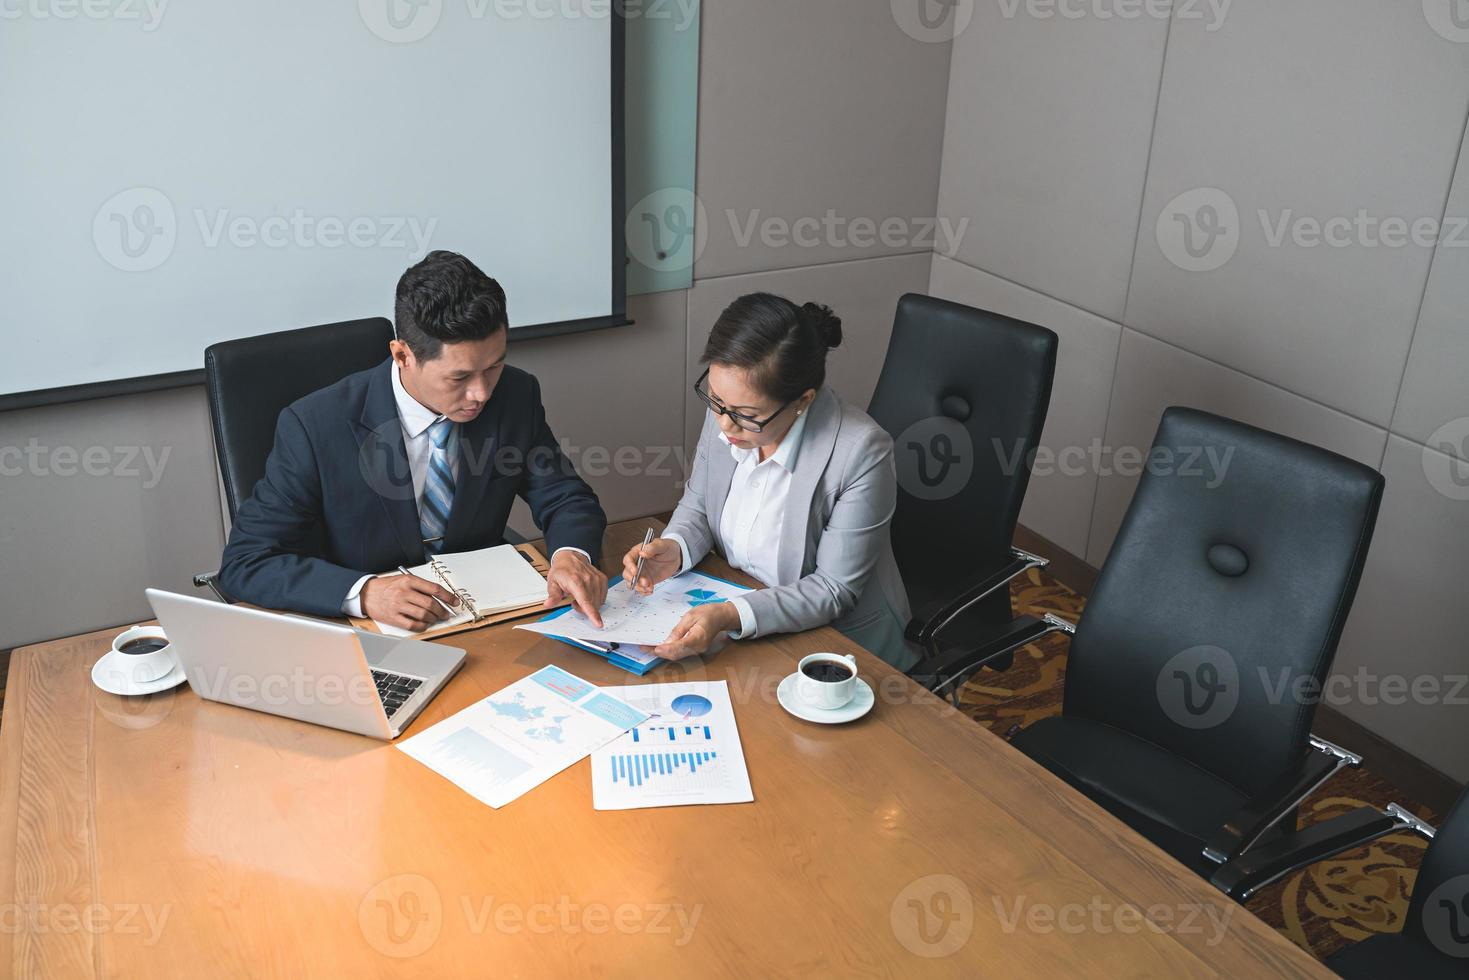 analisando tabelas e gráficos foto